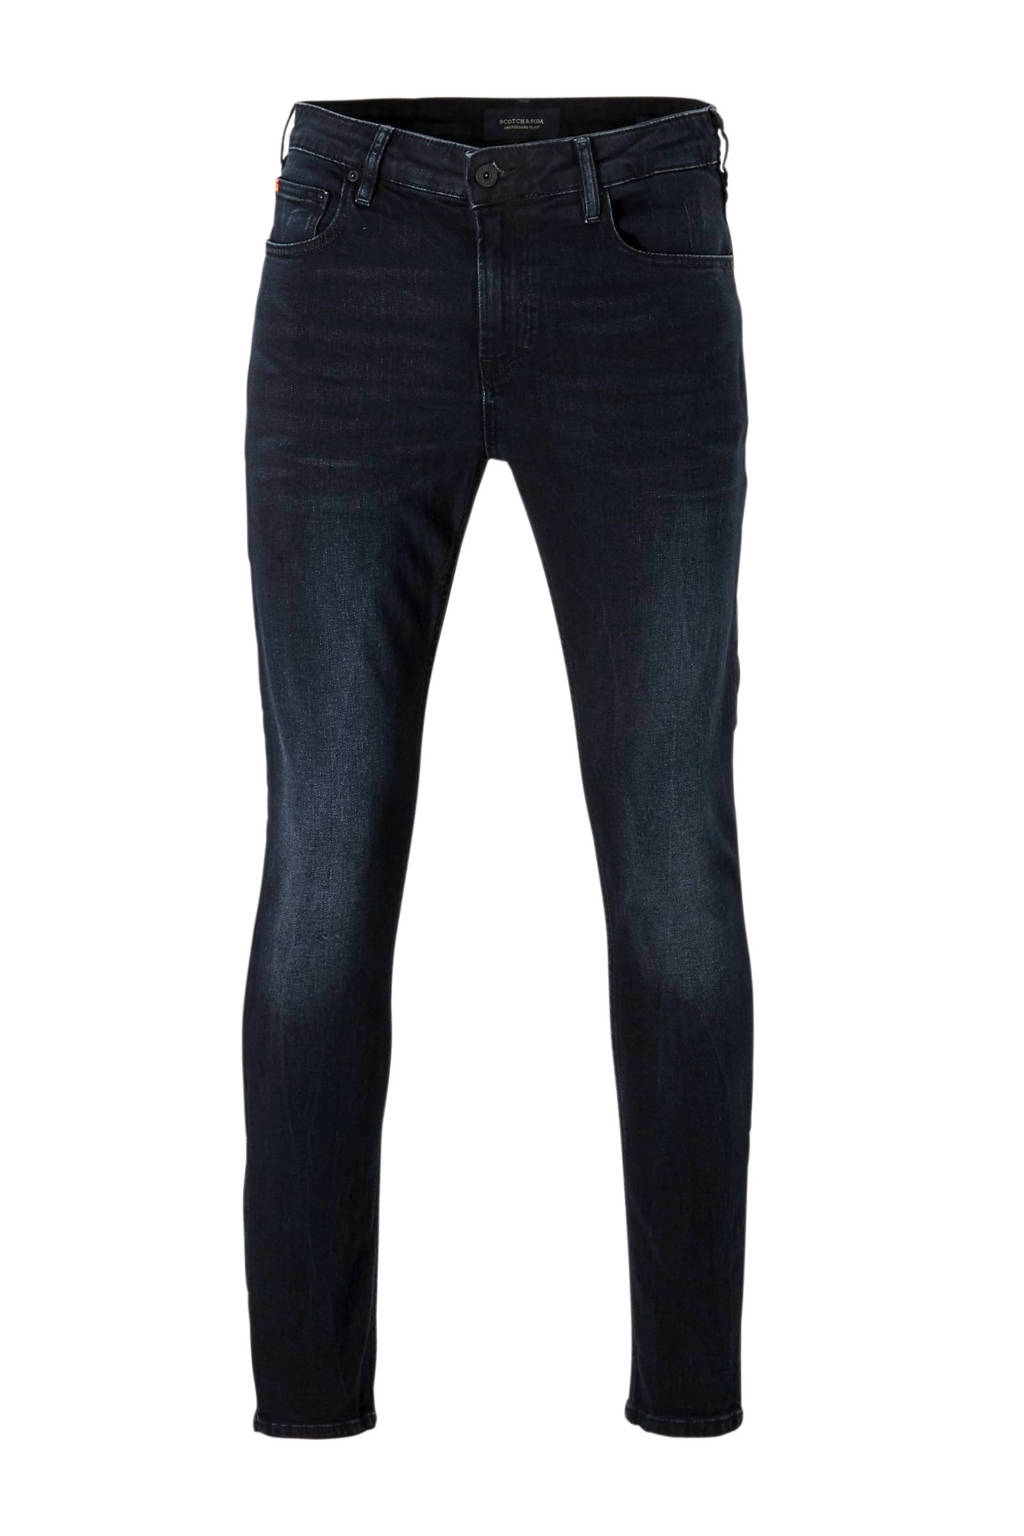 Scotch & Soda skinny jeans Skim, Dark denim